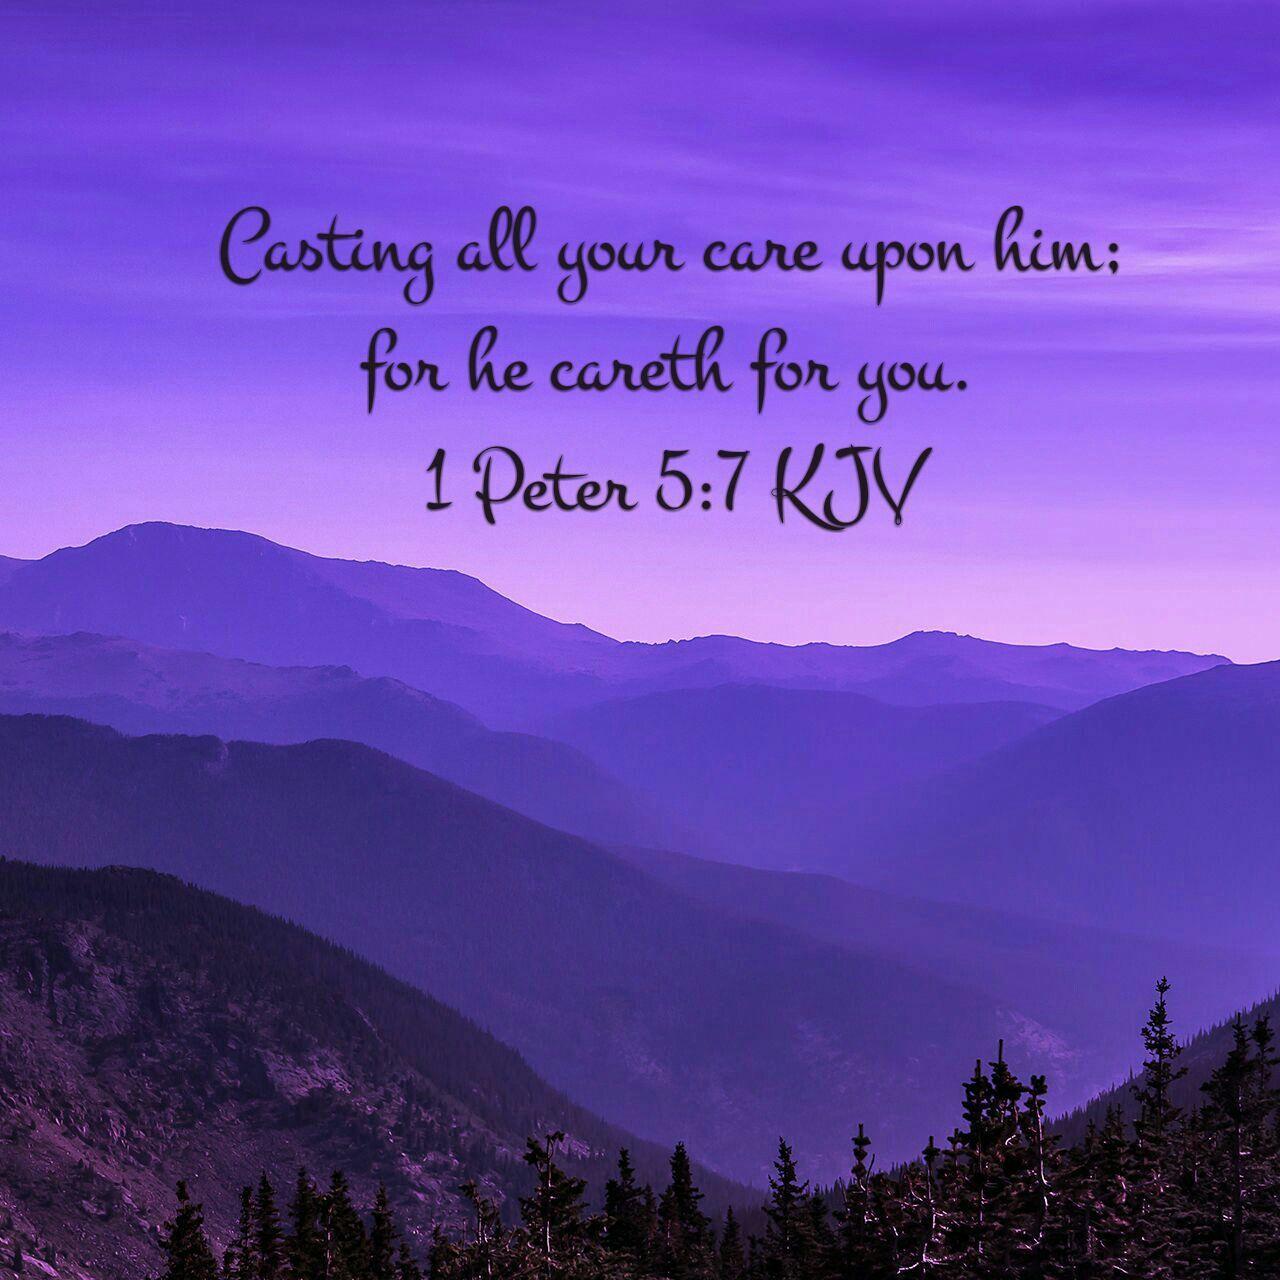 1 Peter 5:7 KJV | ~Bible verses~ | Pinterest